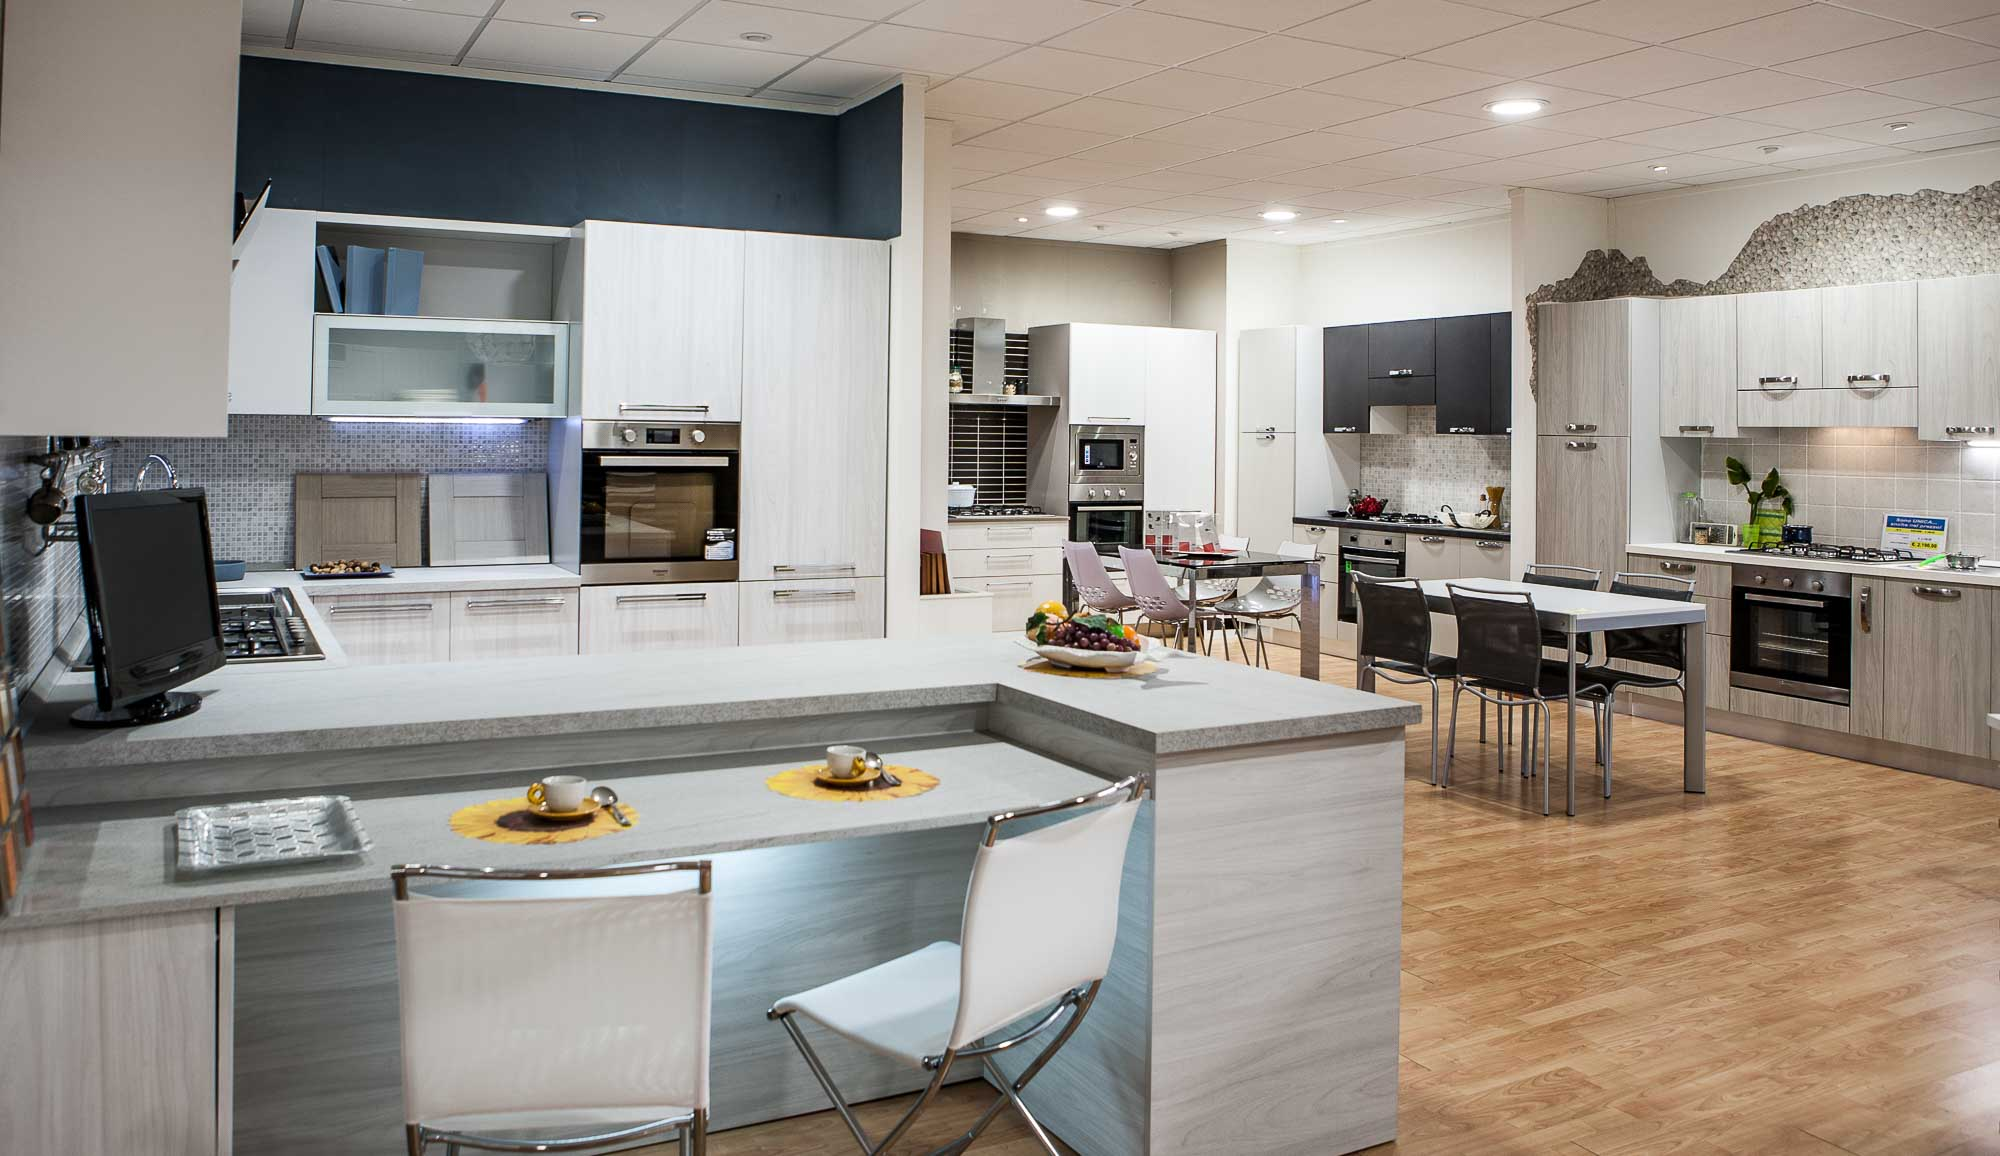 Stunning cucine e salotti insieme gallery home ideas - Cucine e salotti insieme ...